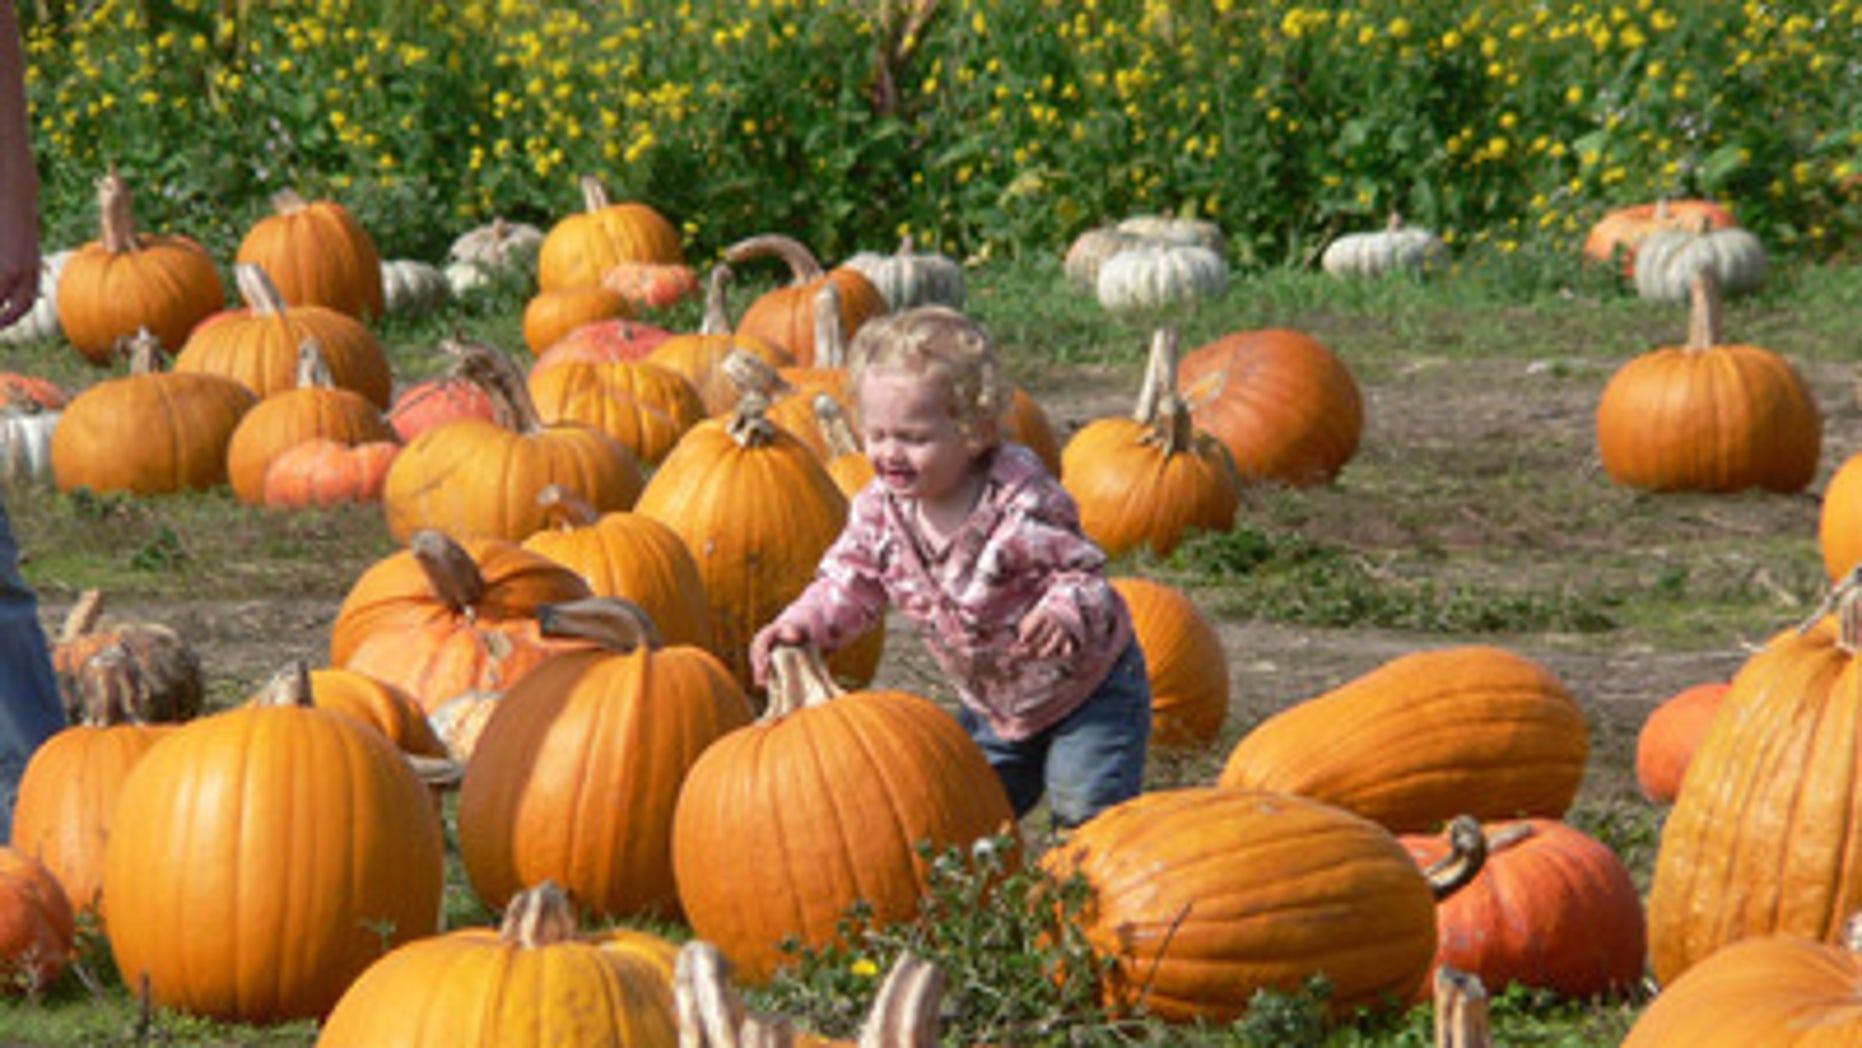 Pumpkin picking in Half Moon Bay, California.